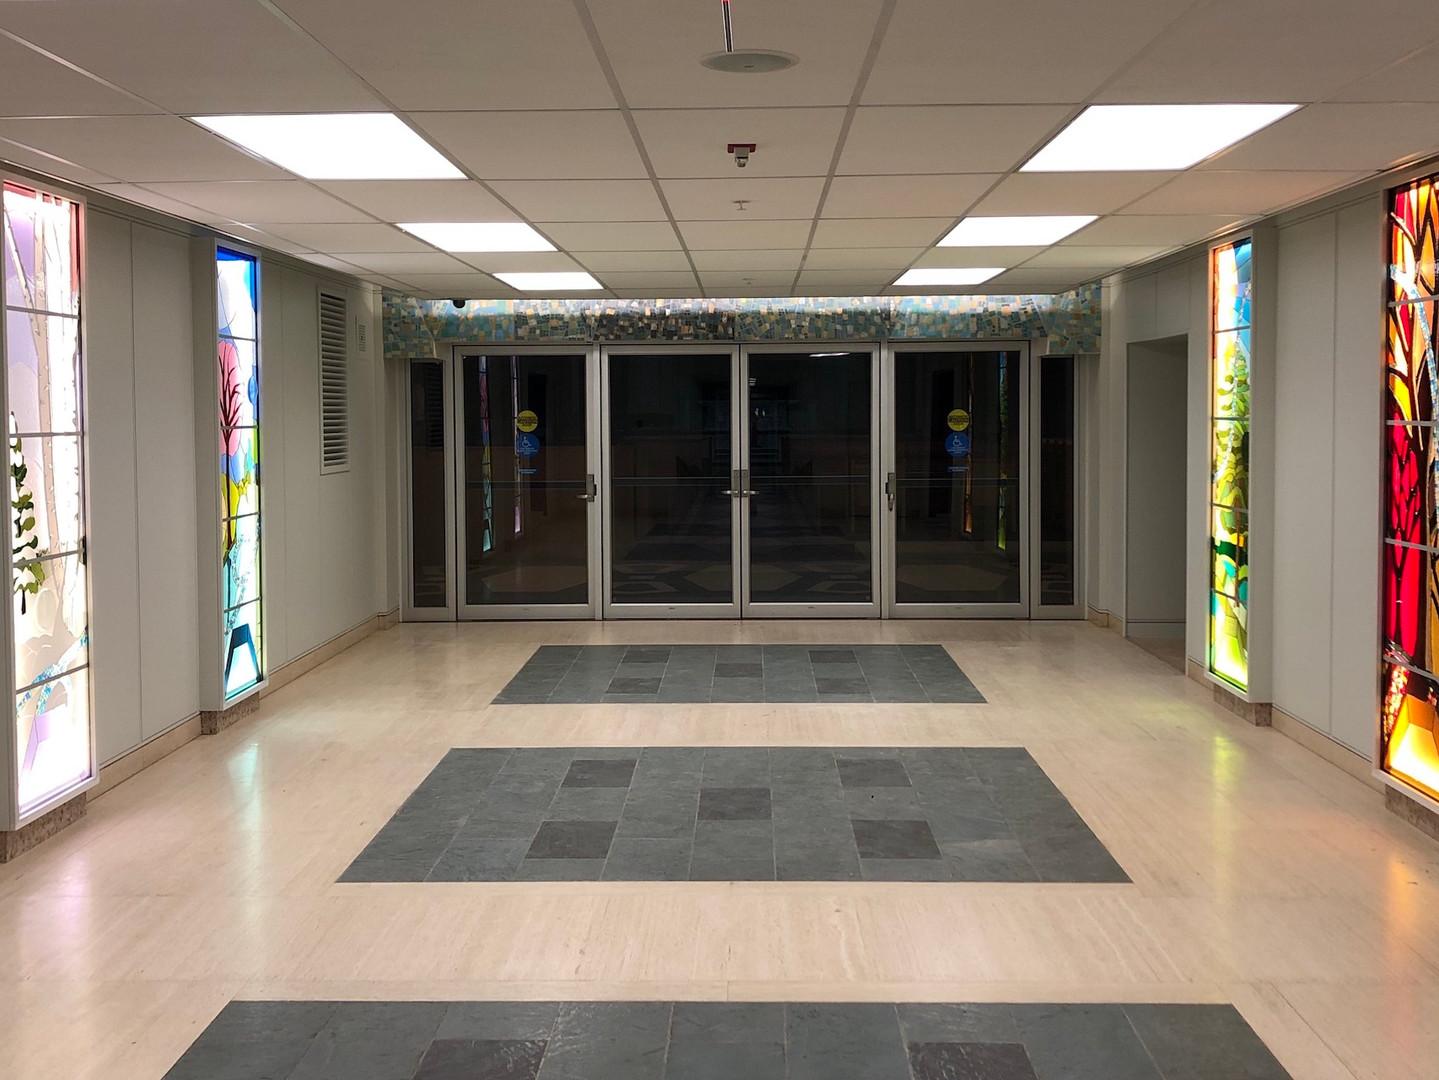 Tyndale Chapel Foyer Installation